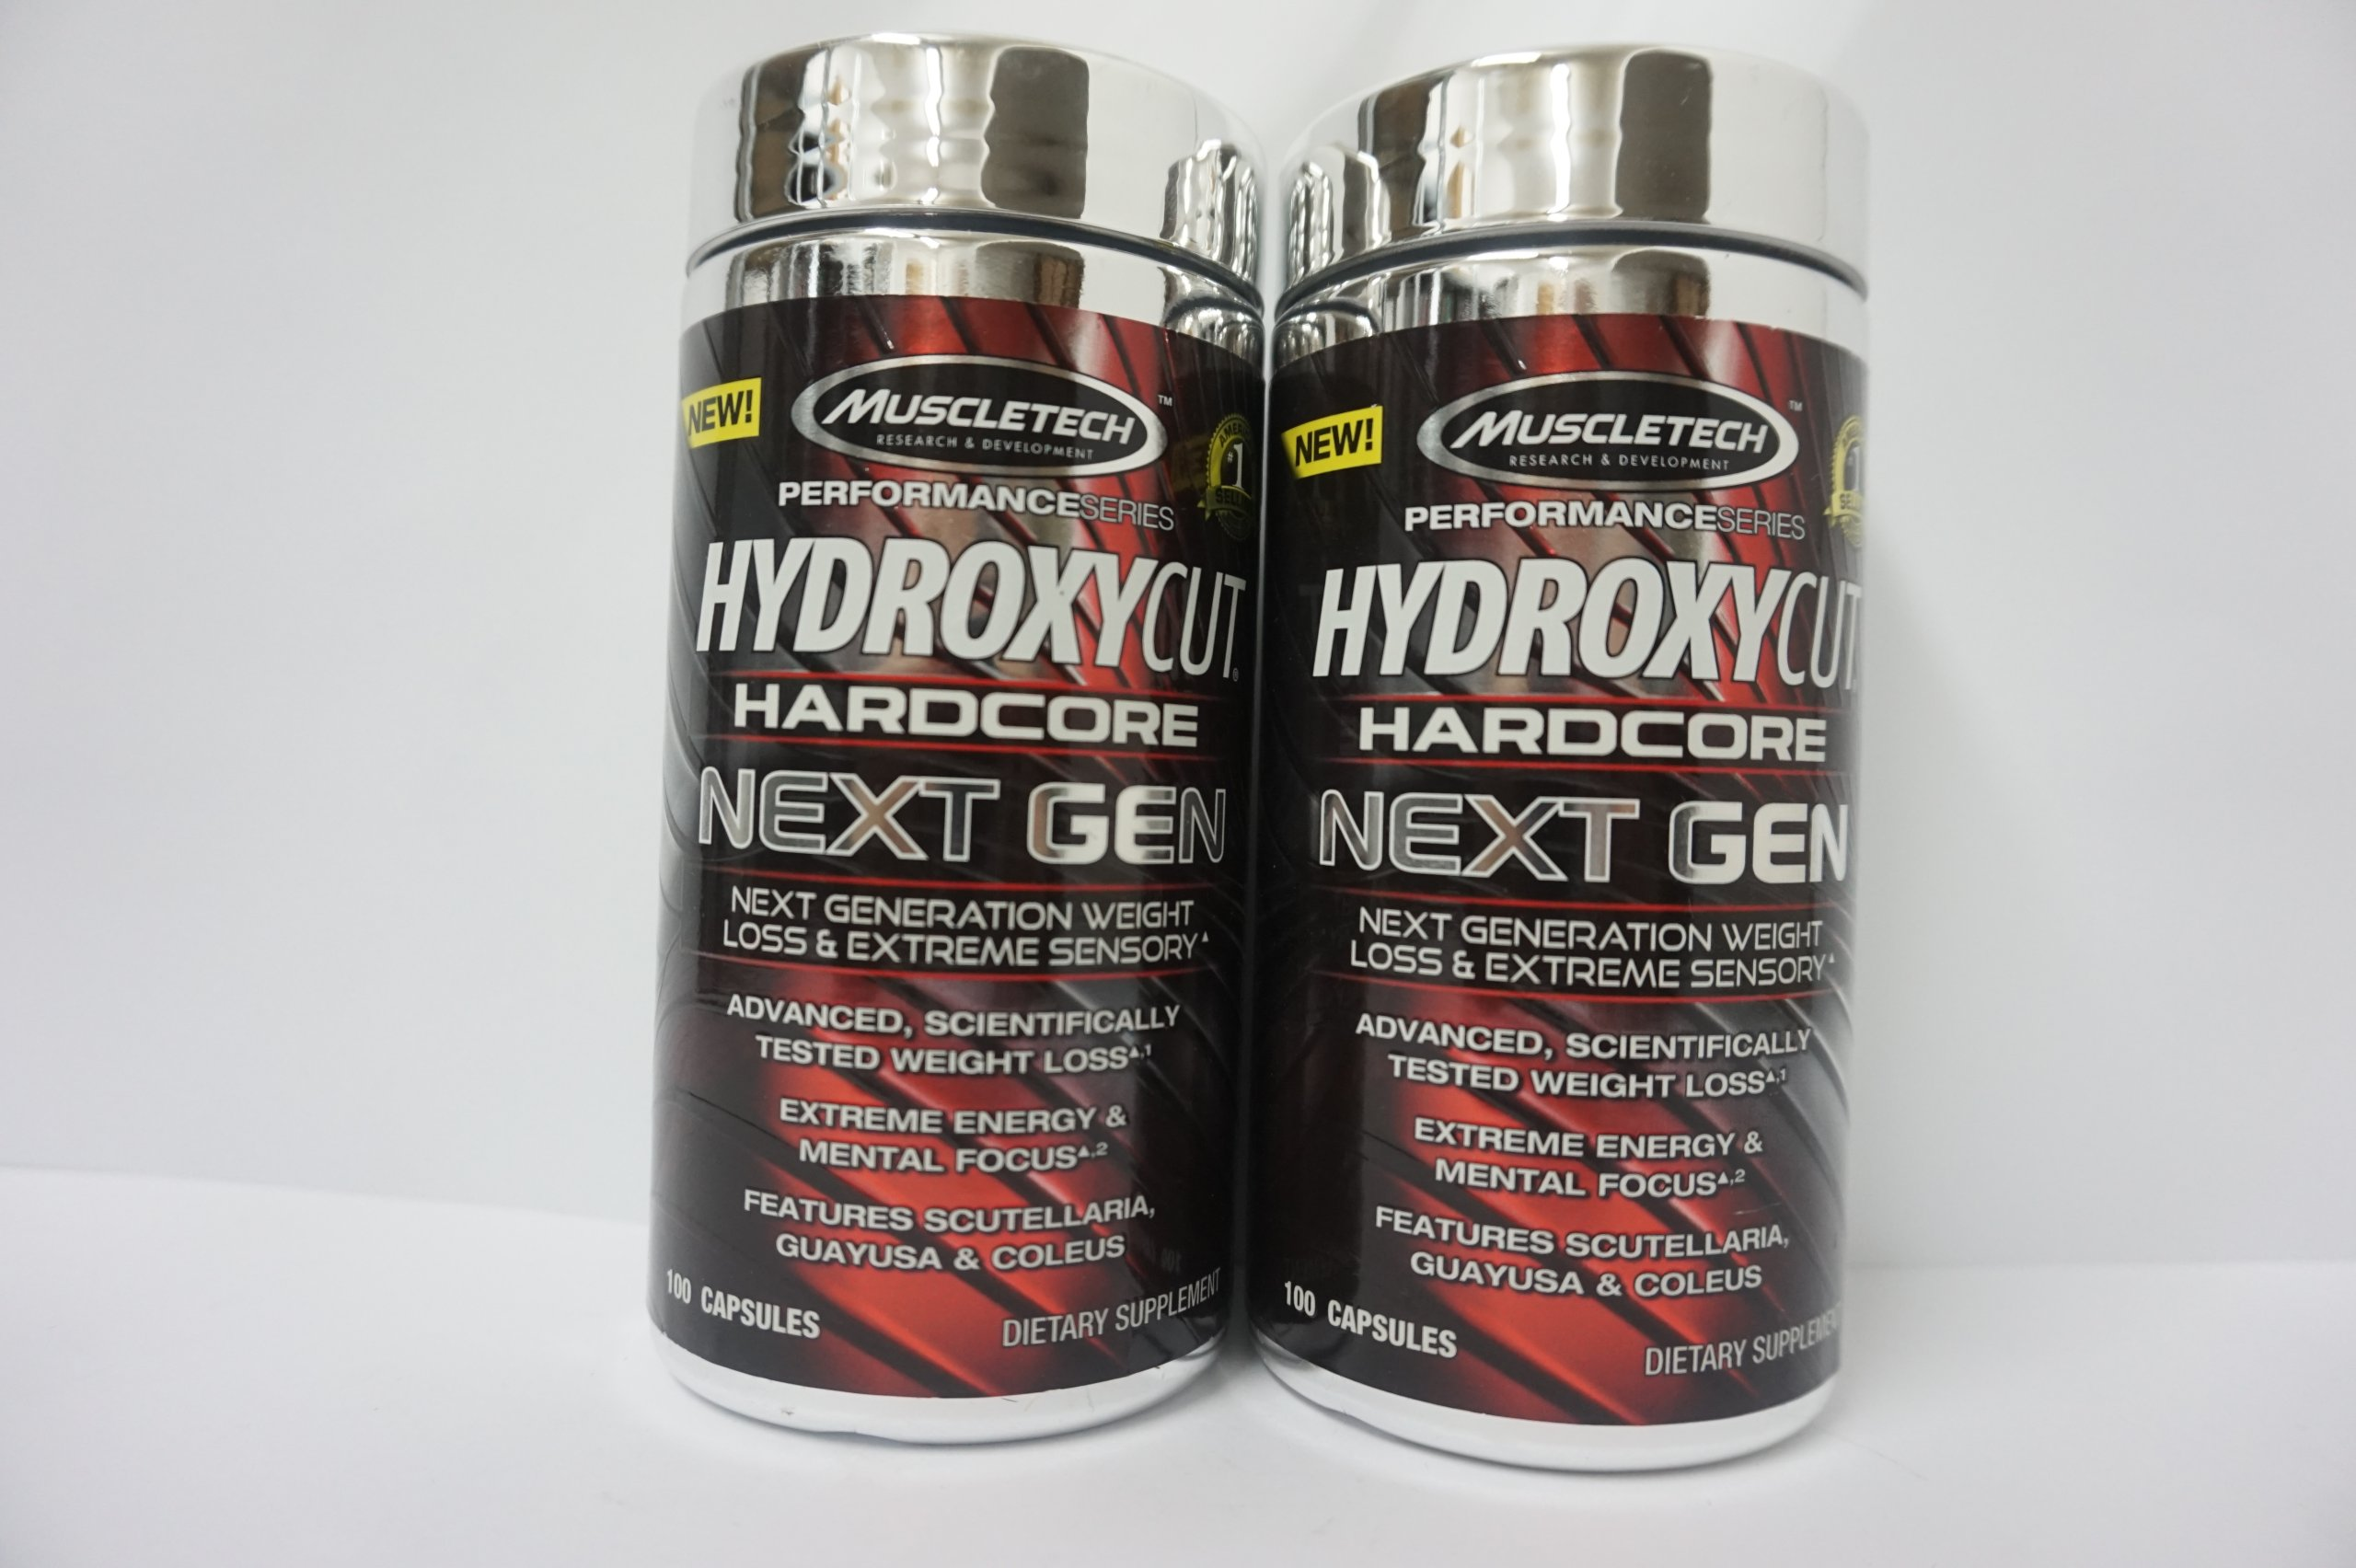 Muscletech Hydroxycut Hardcore Next Gen 100kap Usa 6522519620 Elite 100 Caps Original